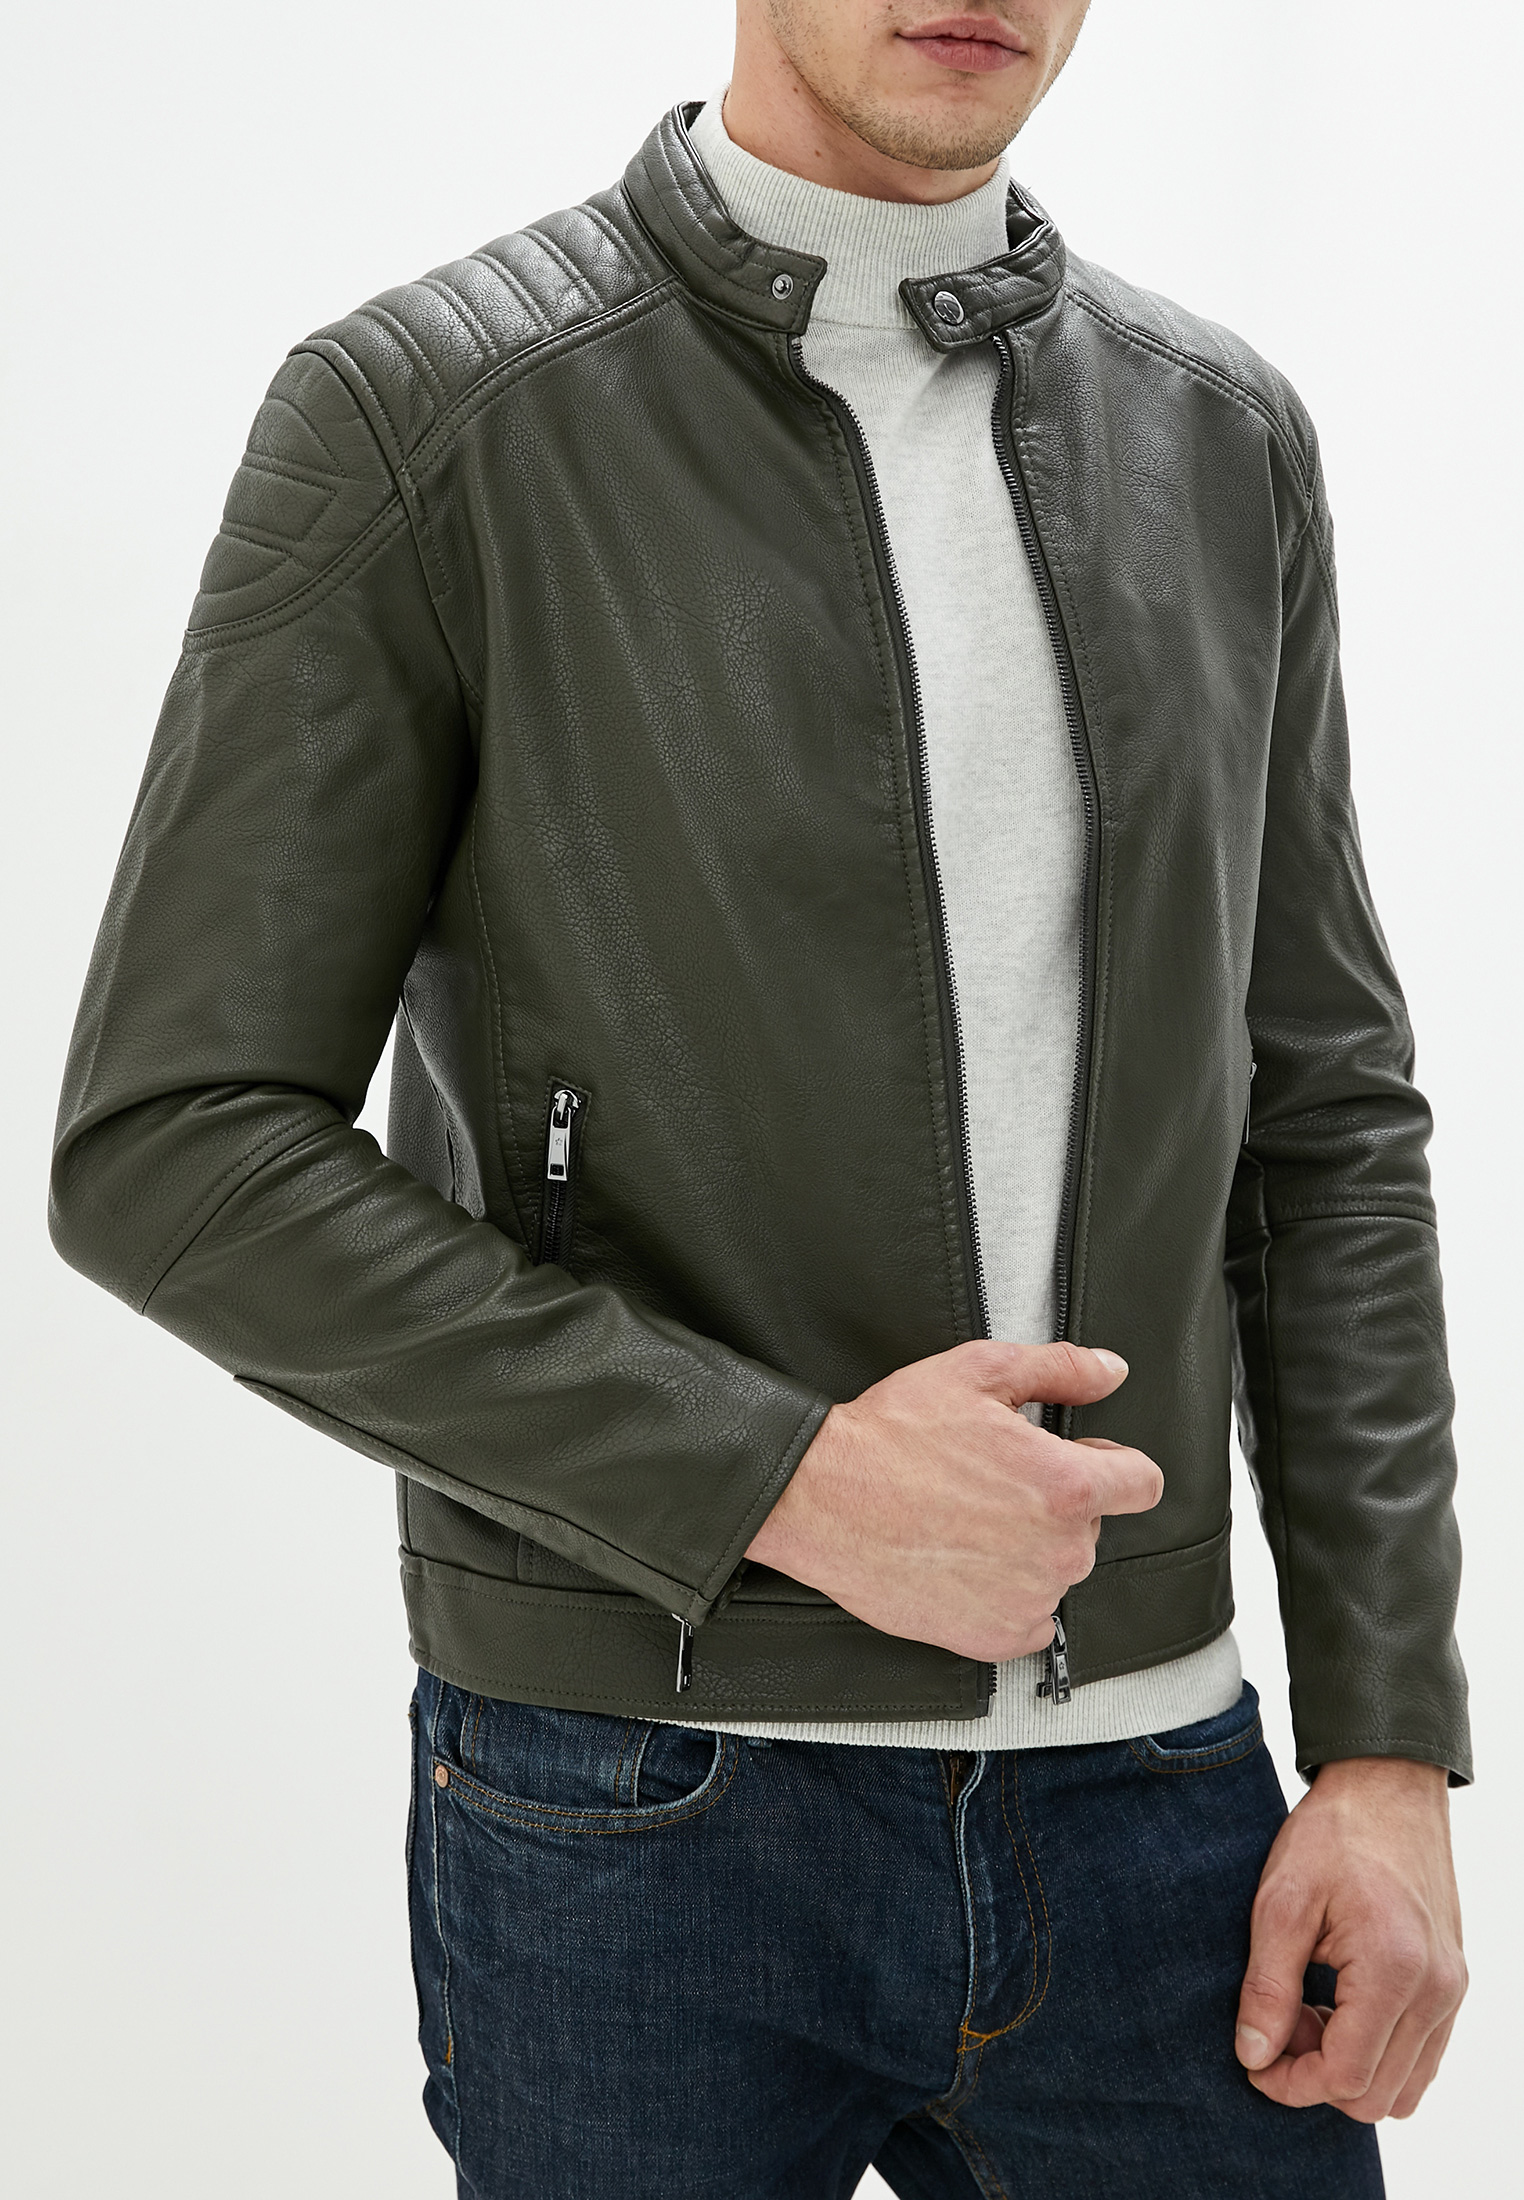 Куртка кожаная, Celio, цвет: хаки. Артикул: CE007EMEEYU7. Одежда / Верхняя одежда / Кожаные куртки